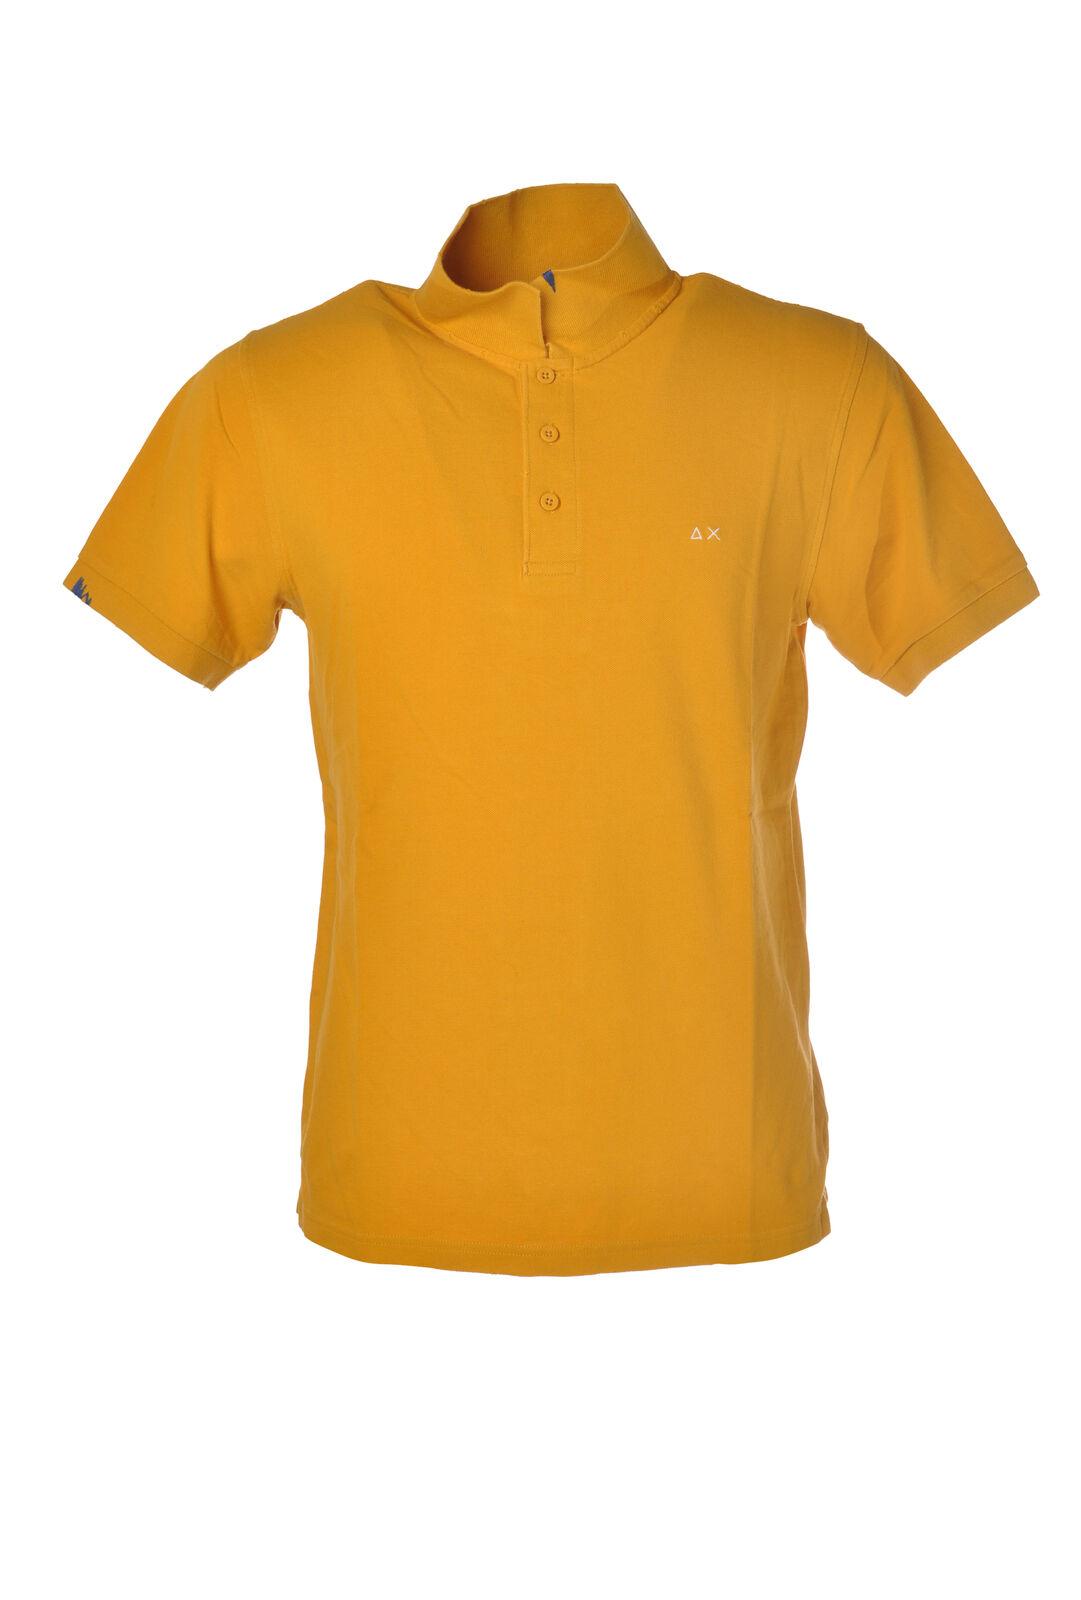 Sun 68 - Topwear Polo - Mann - yellow - 6000113C191353